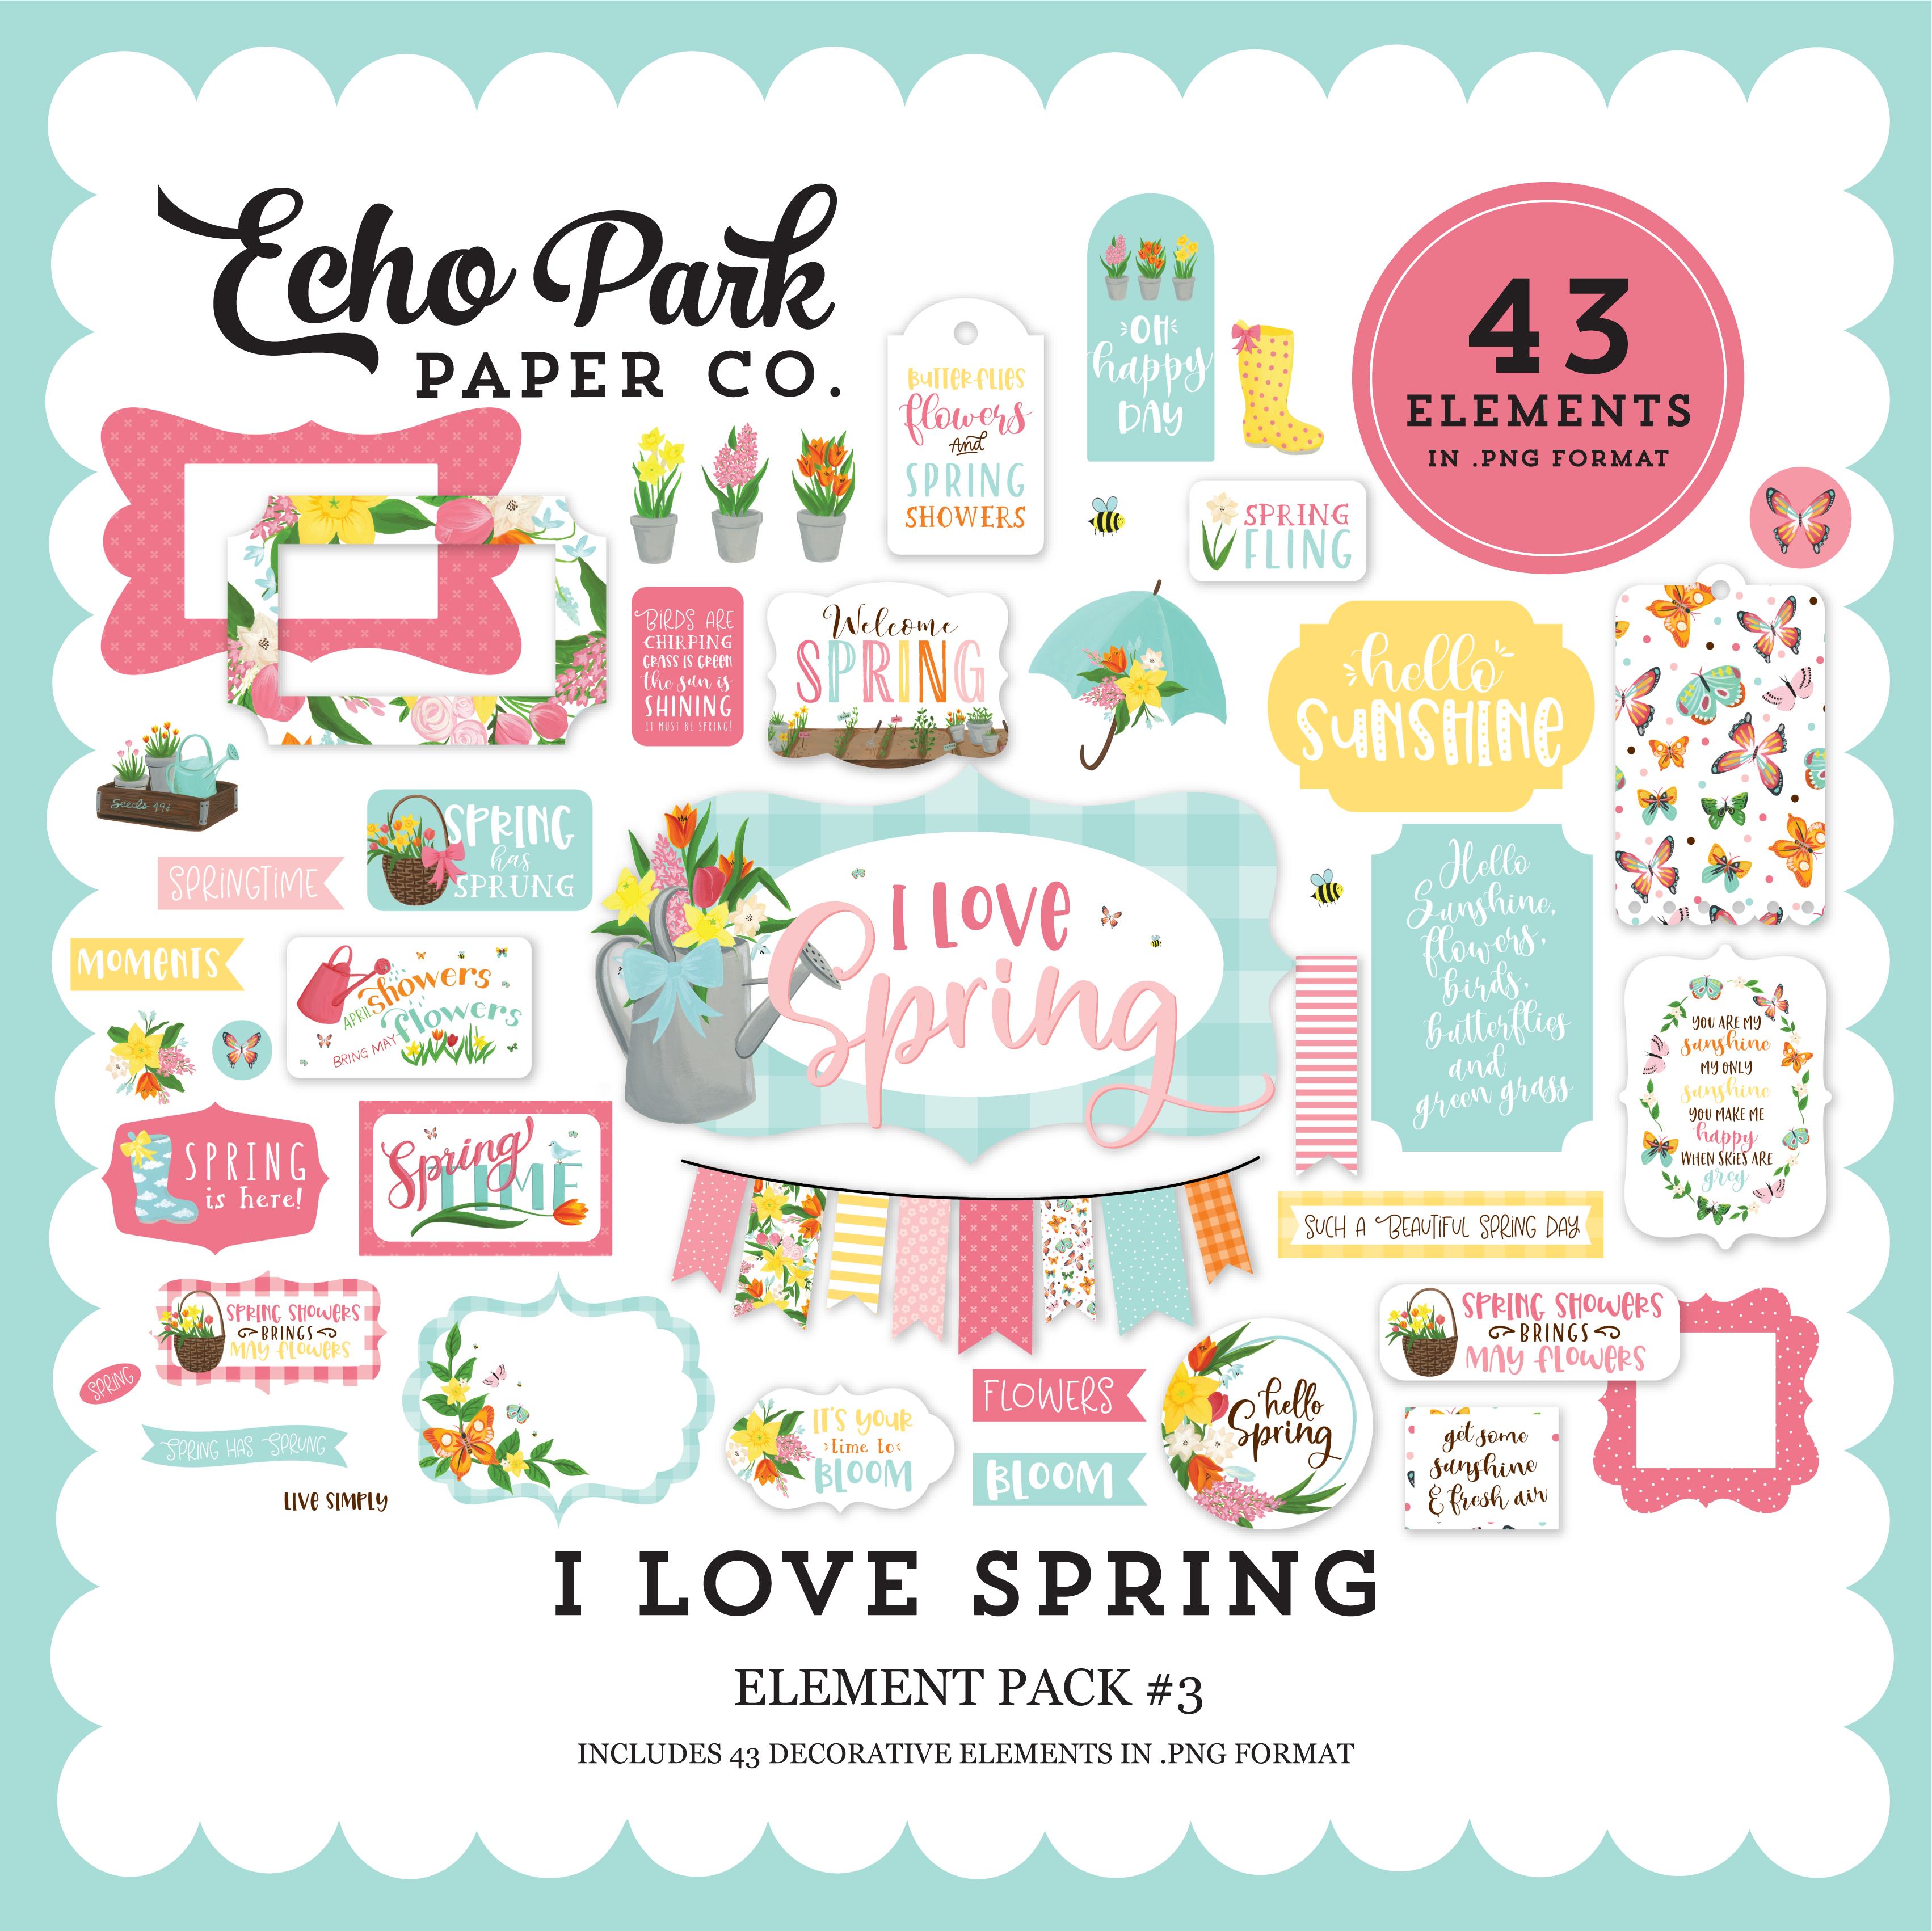 I Love Spring Element Pack #3